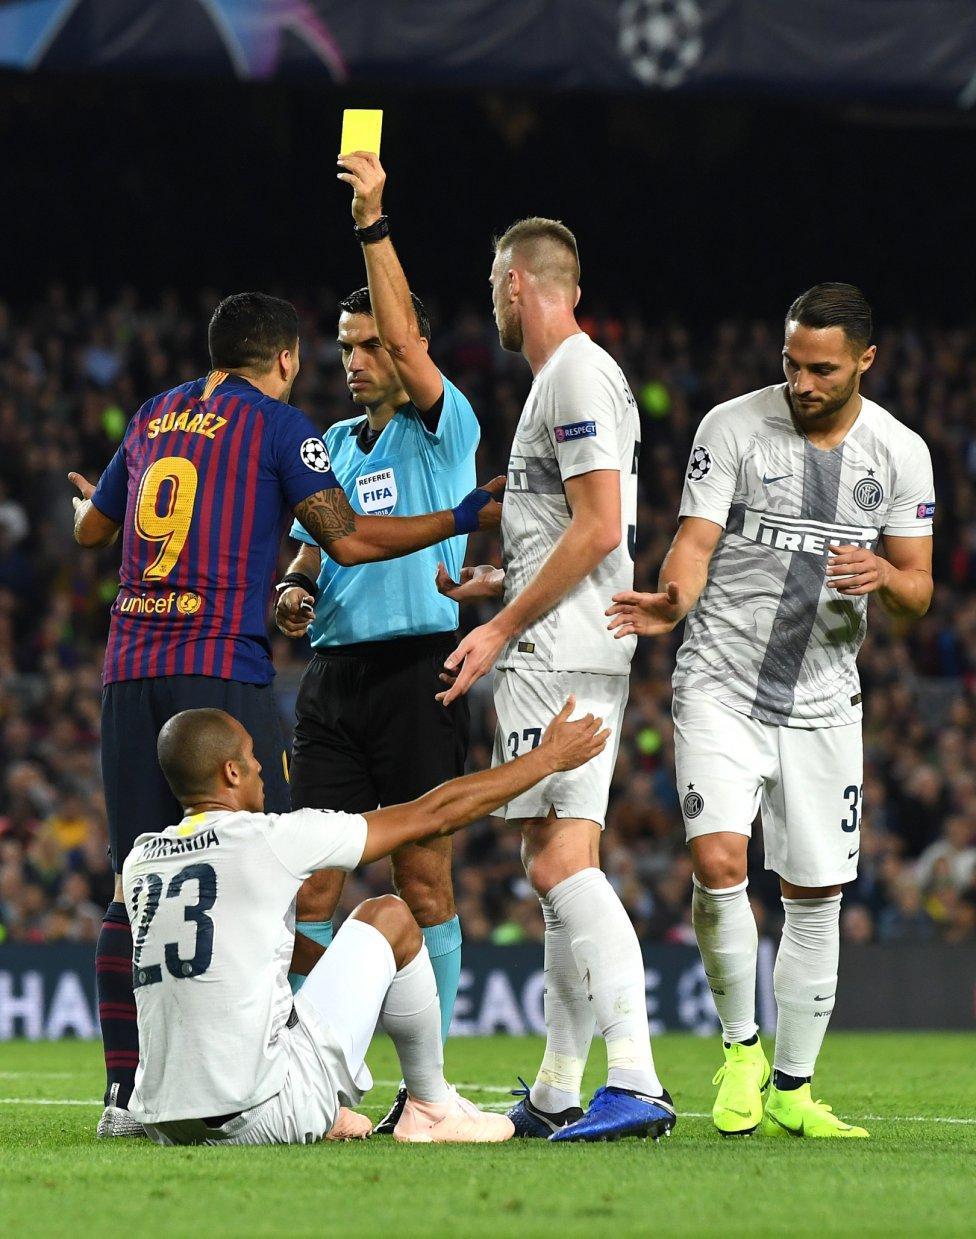 صور مباراة : برشلونة - إنتر ميلان 2-0 ( 24-10-2018 )  1540408387_114463_1540414325_album_grande